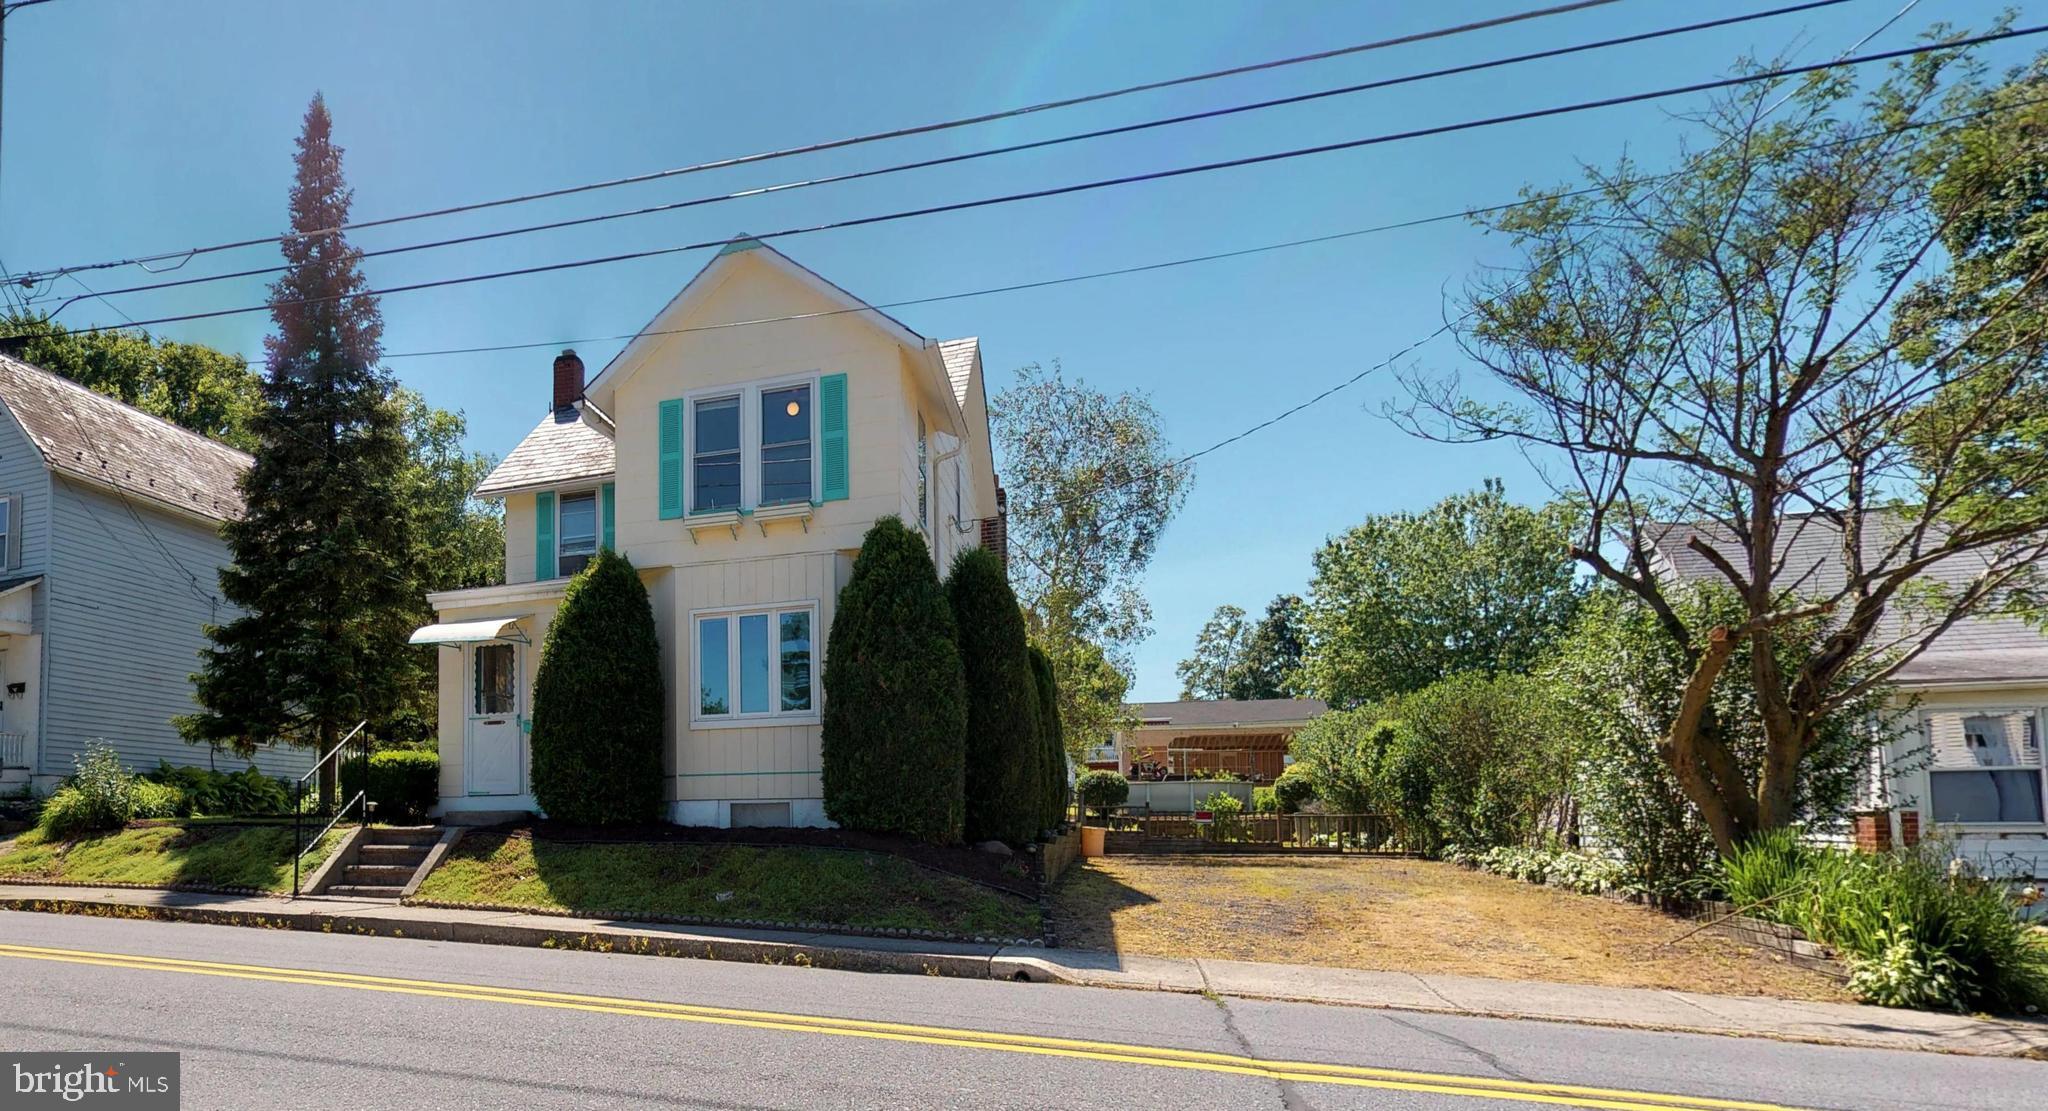 154 S 8TH STREET, BANGOR, PA 18013